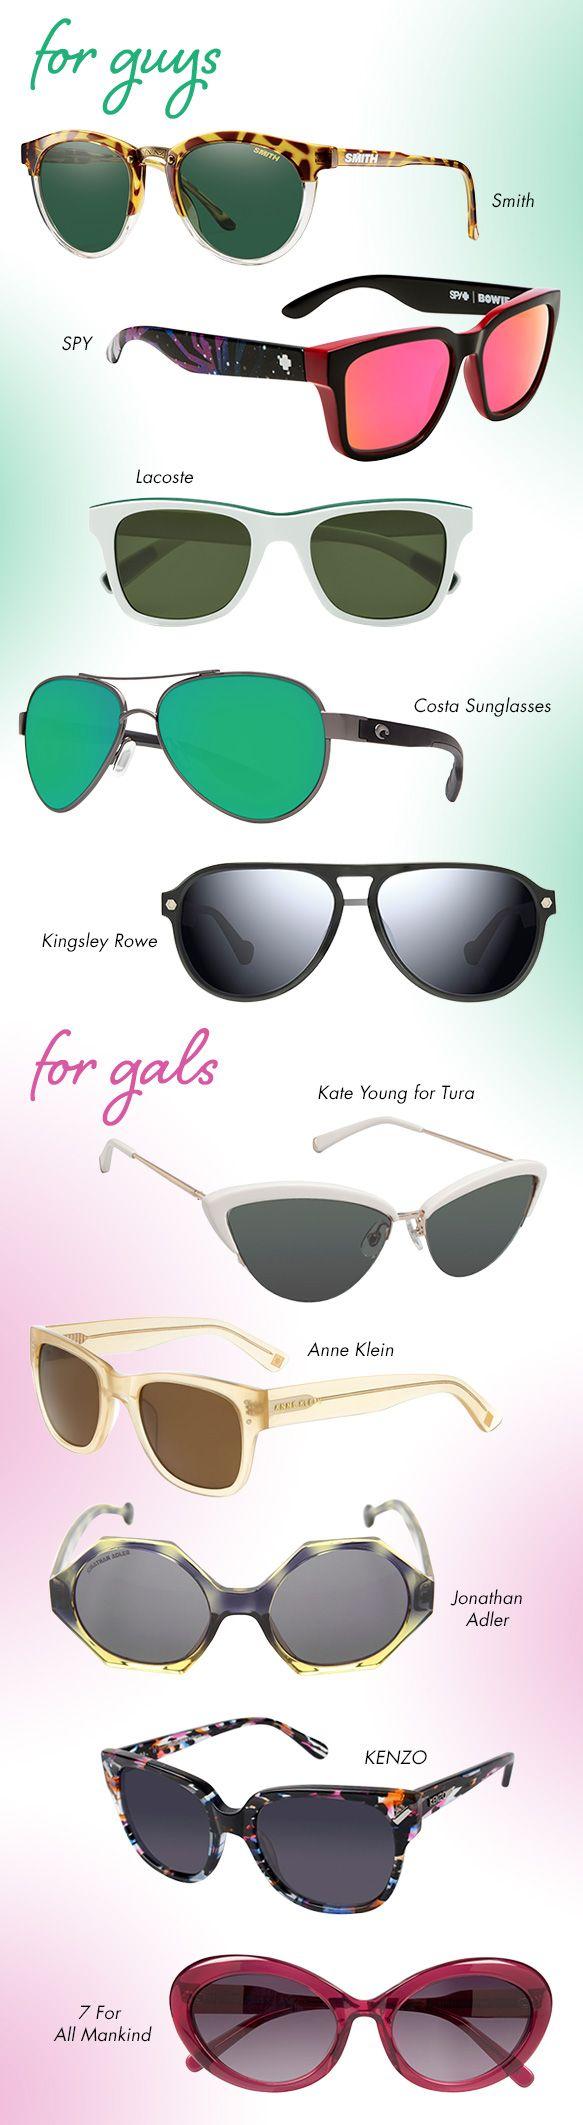 7 best GenEYEview images on Pinterest | Eye glasses, Eyeglasses and ...